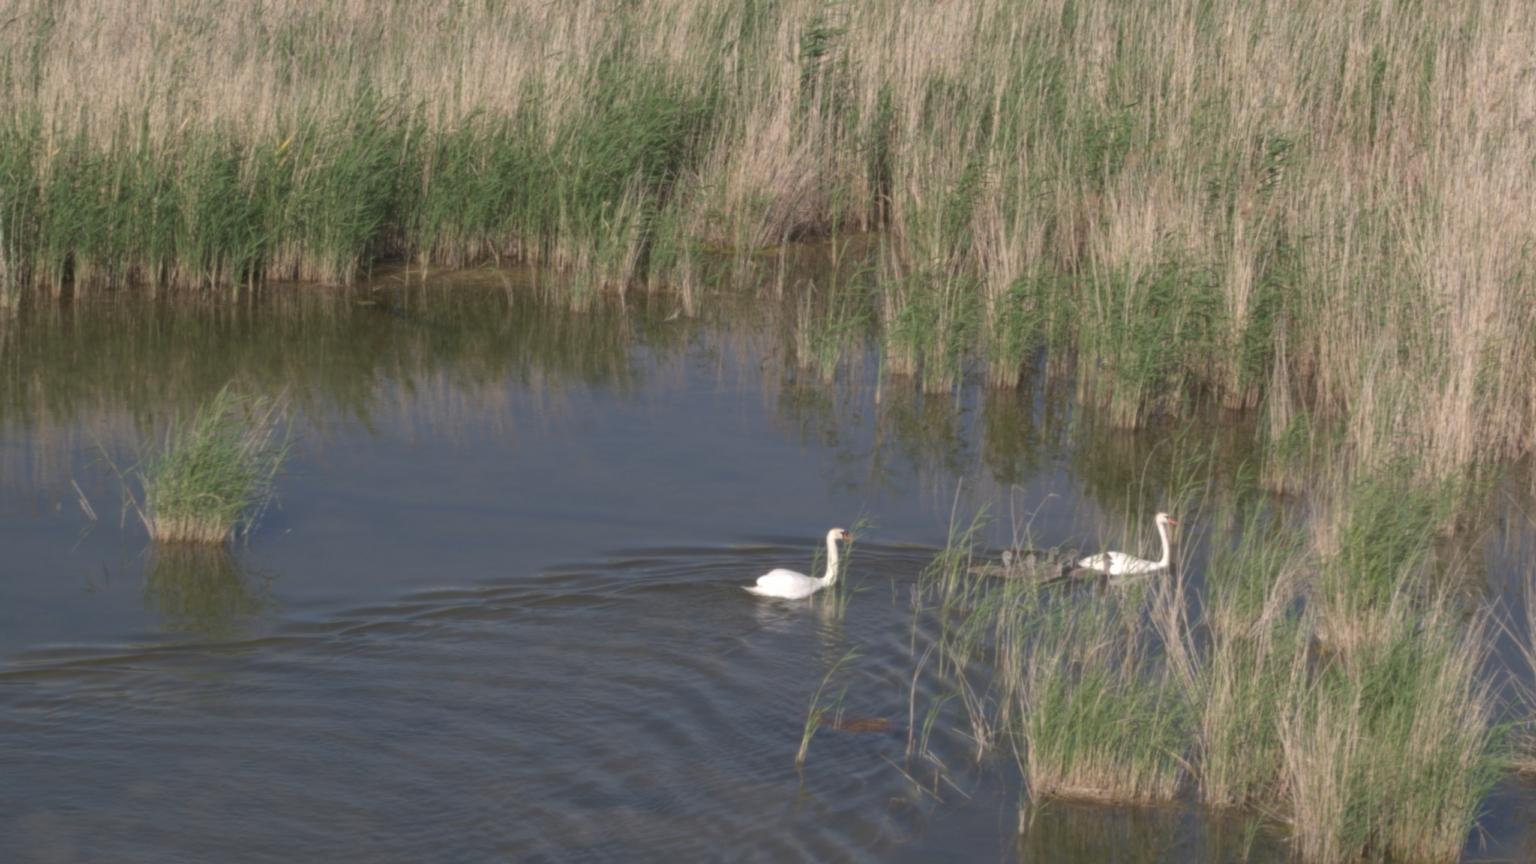 Aslykul_swans_animals_uralmovie_flycamaero